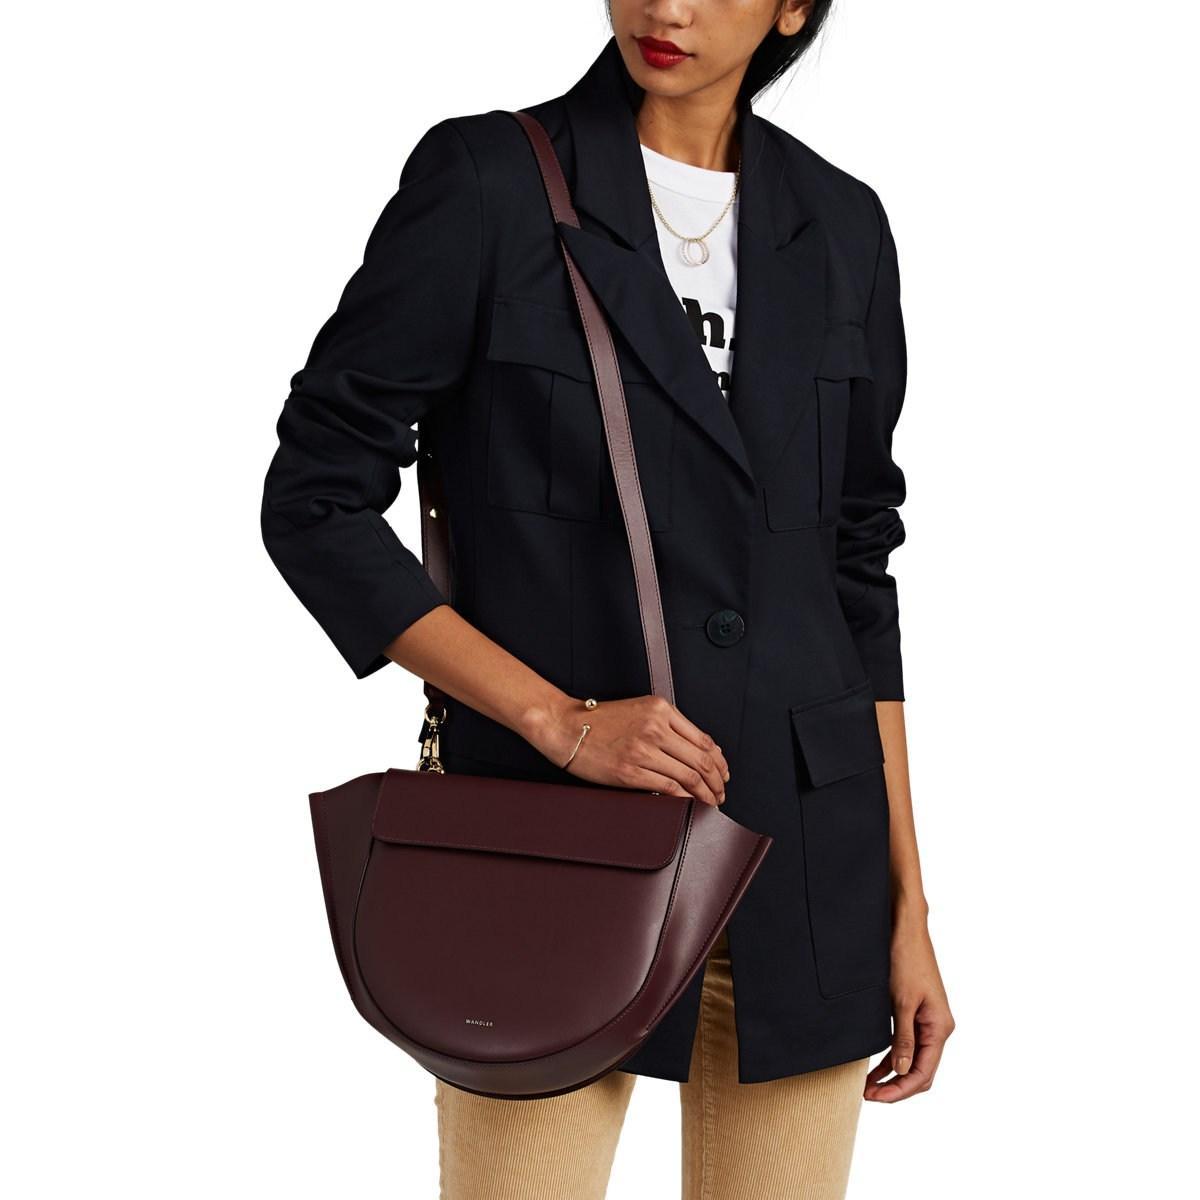 a91b4ebb91 Wandler - Purple Hortensia Medium Leather Shoulder Bag - Lyst. View  fullscreen